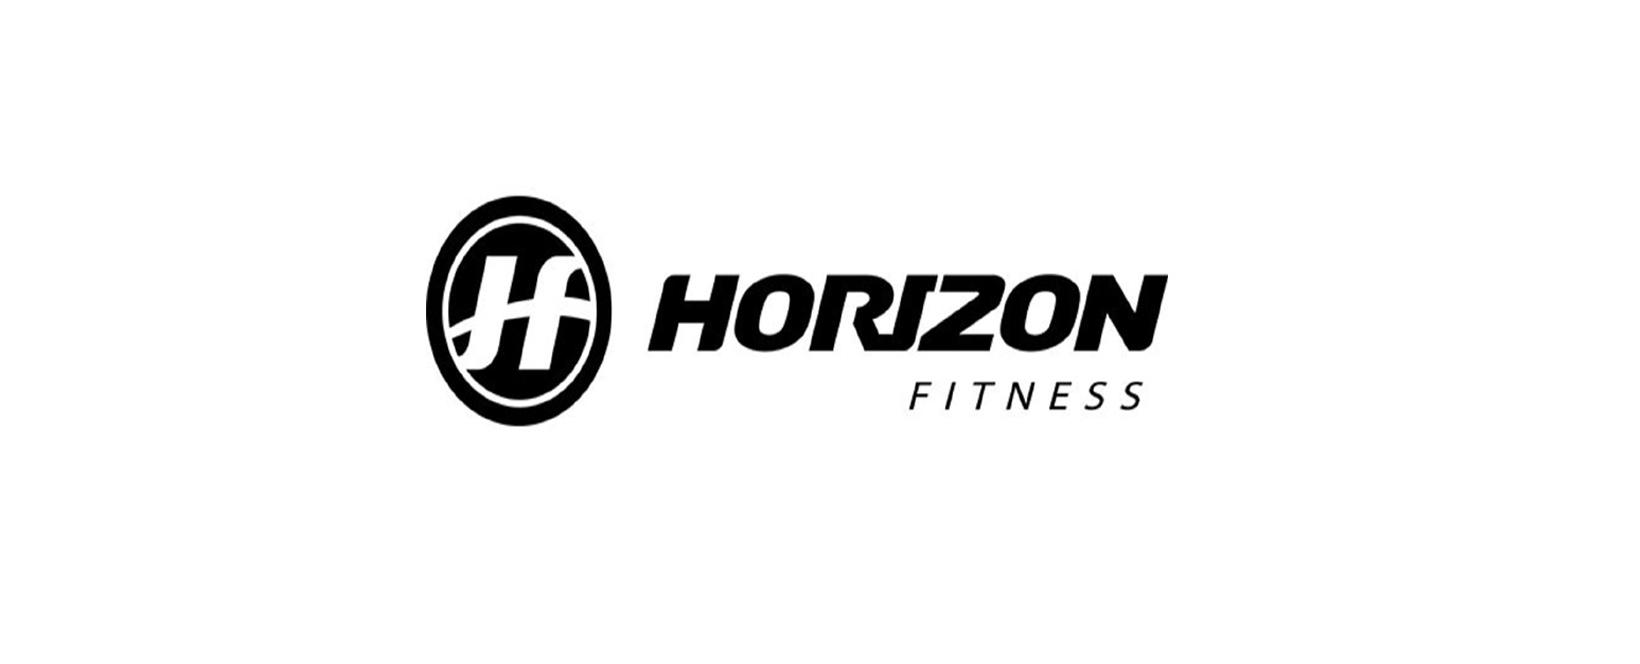 Horizon Fitness Discount Code 2021